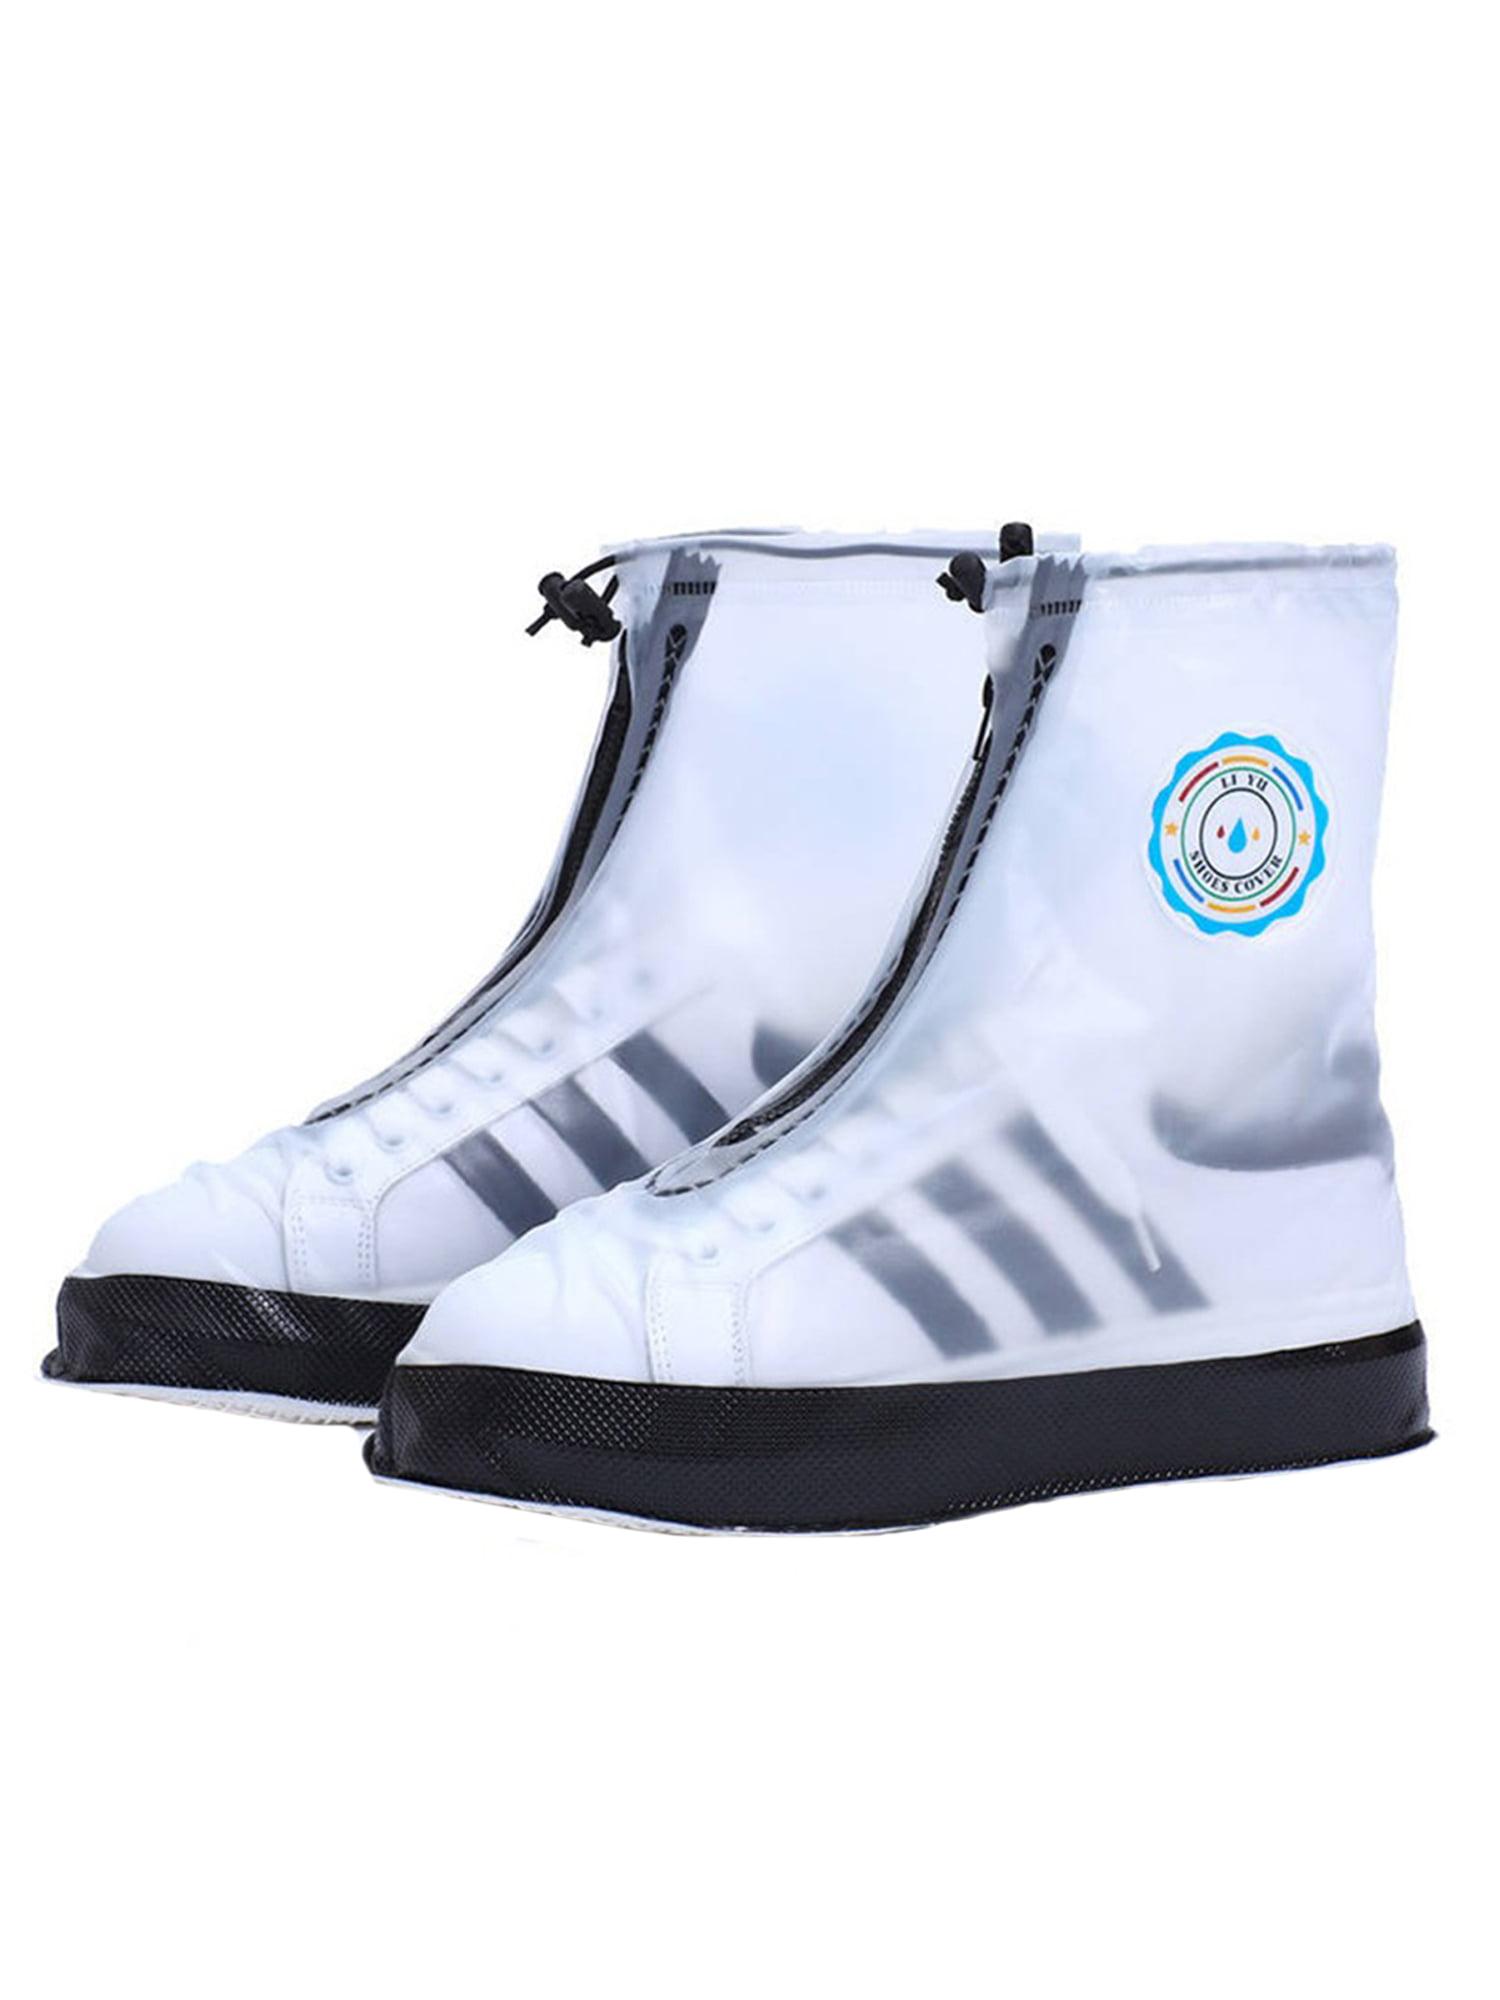 SUNSIOM Adults Waterproof Shoe Boot